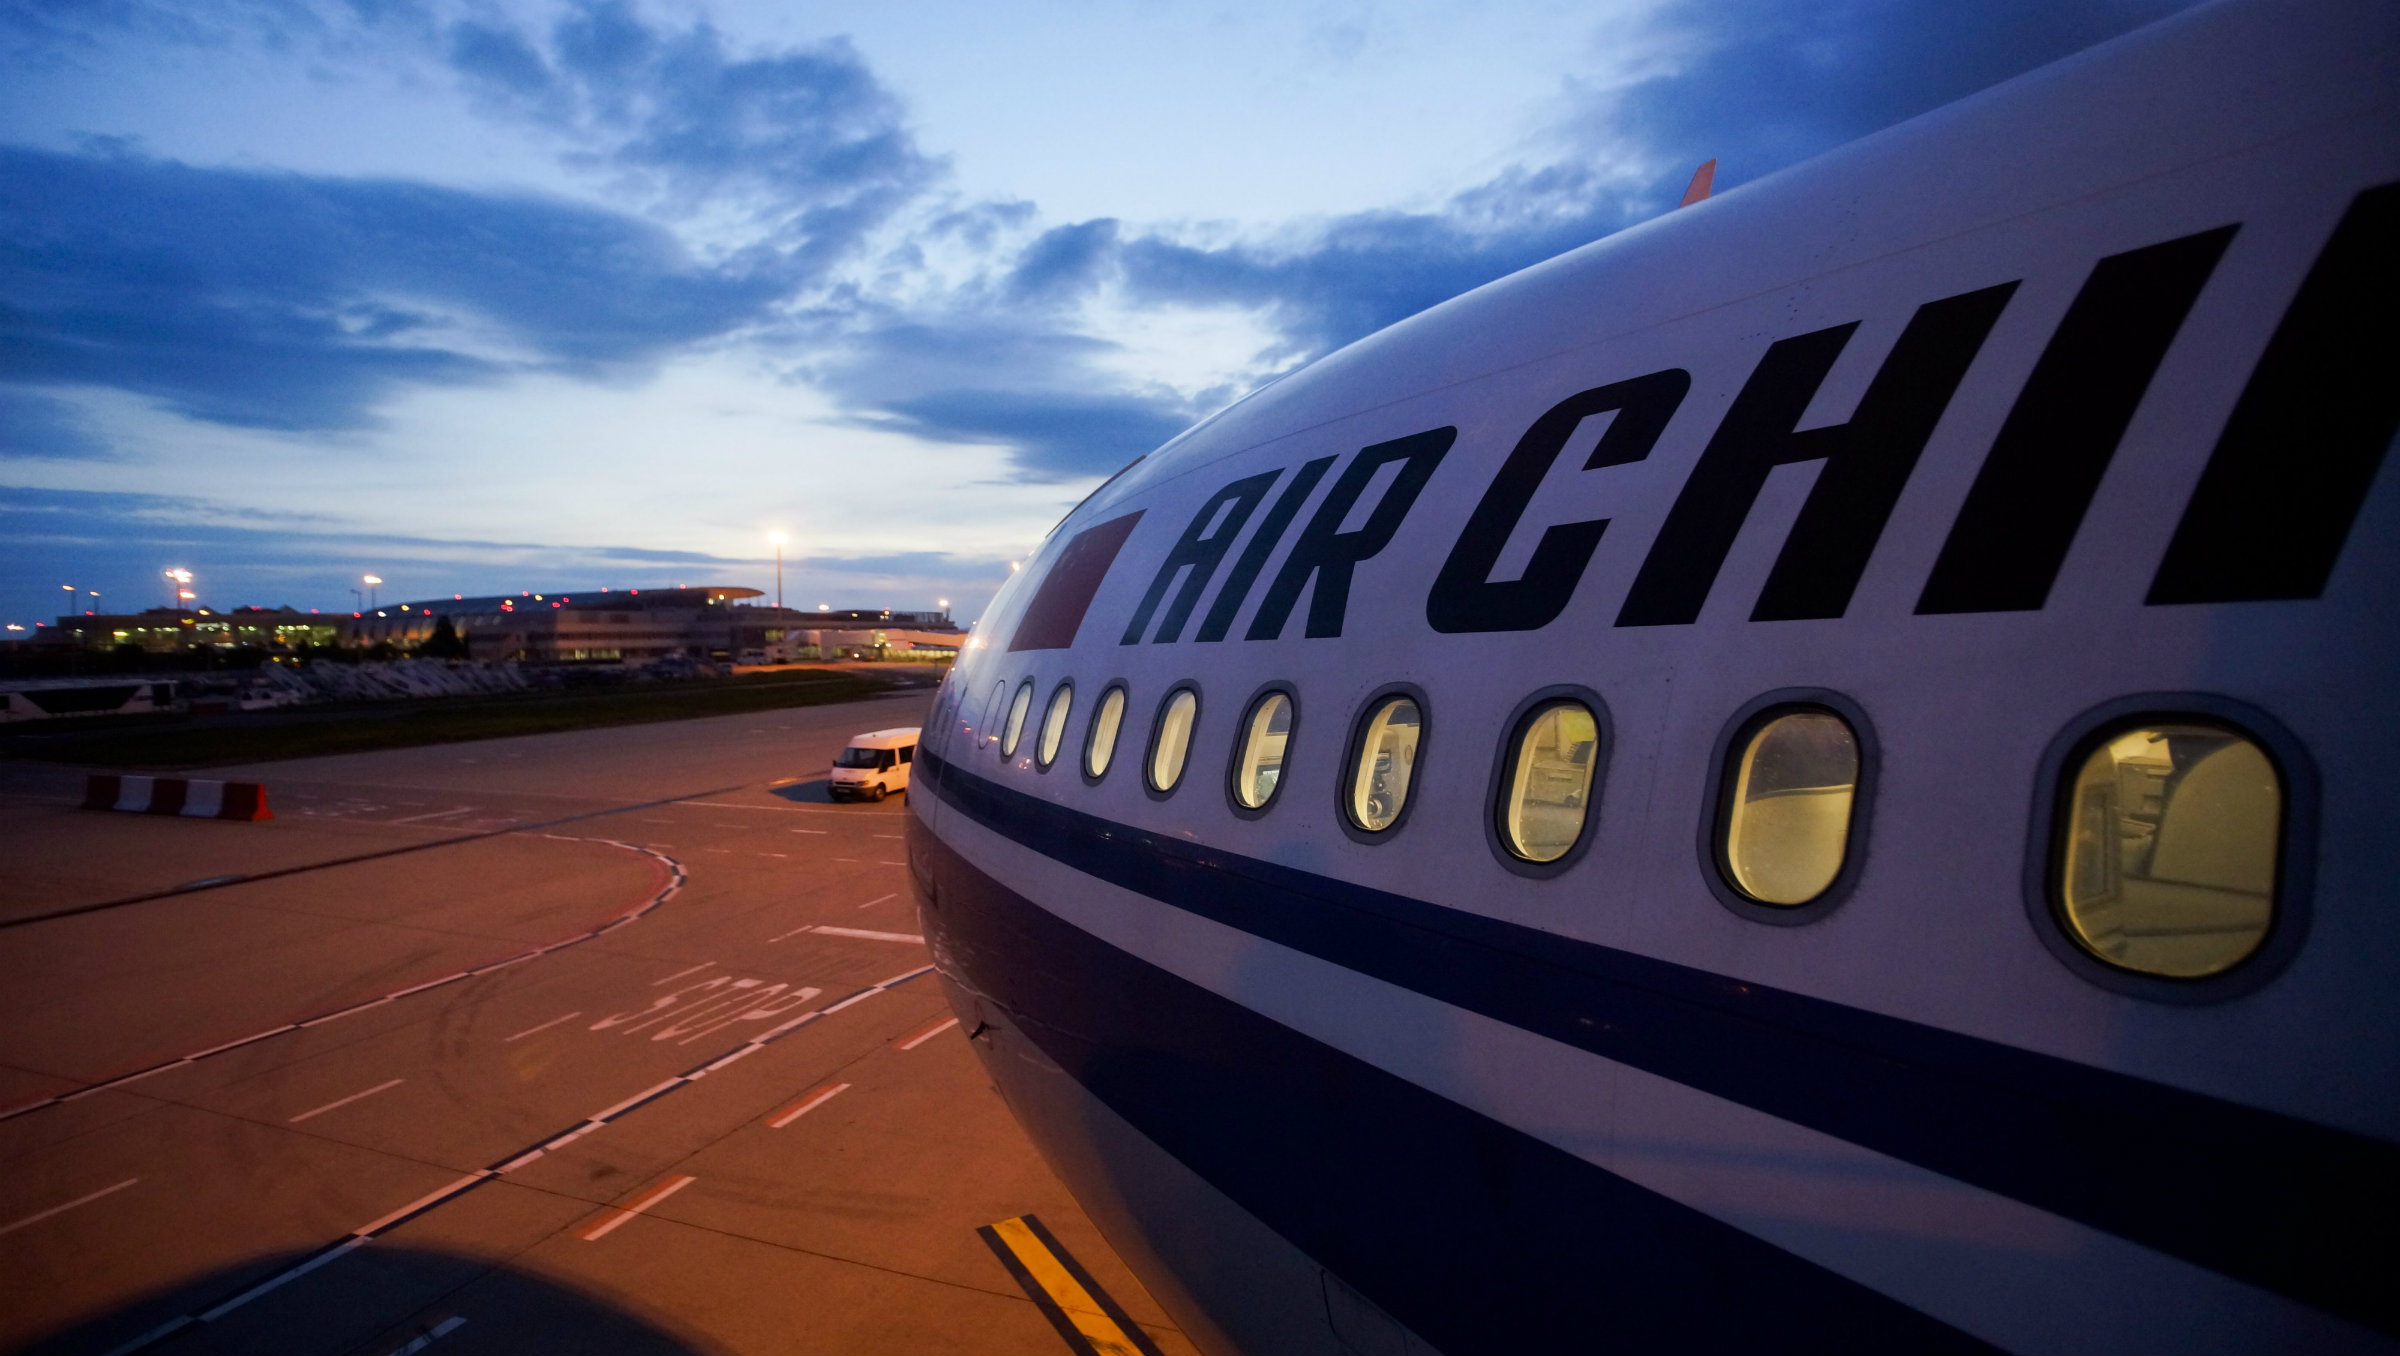 Air China on the tarmac